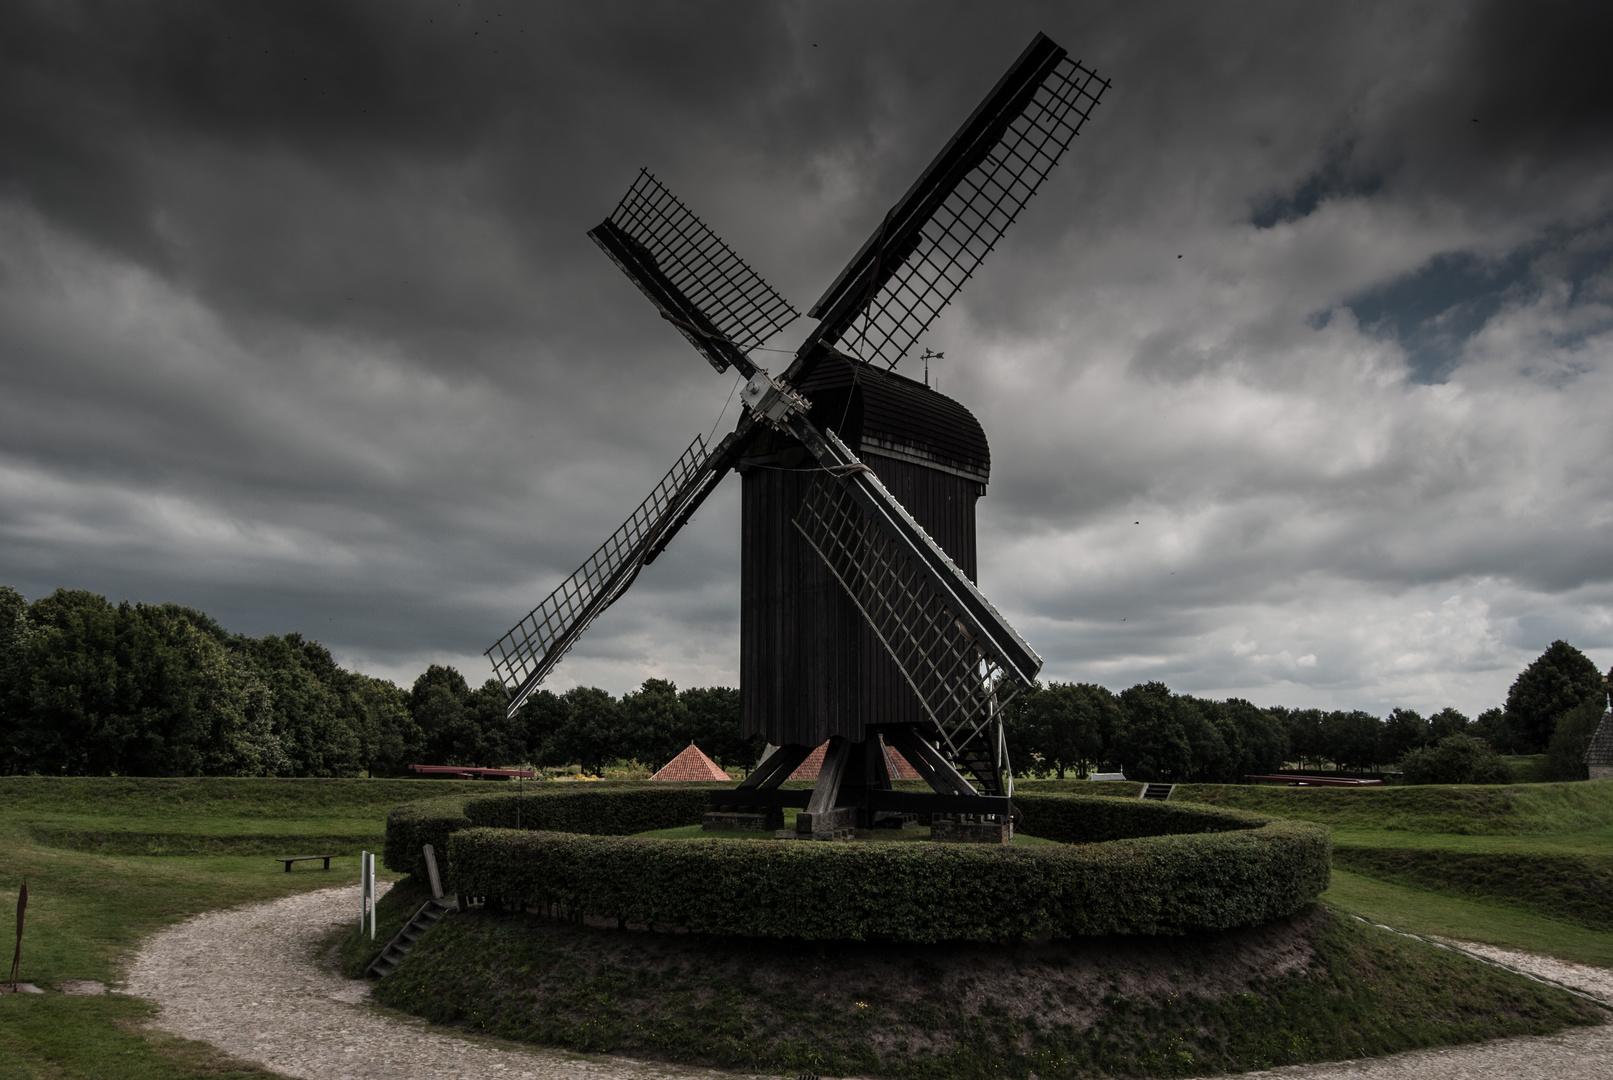 Windmühle in Bourtange